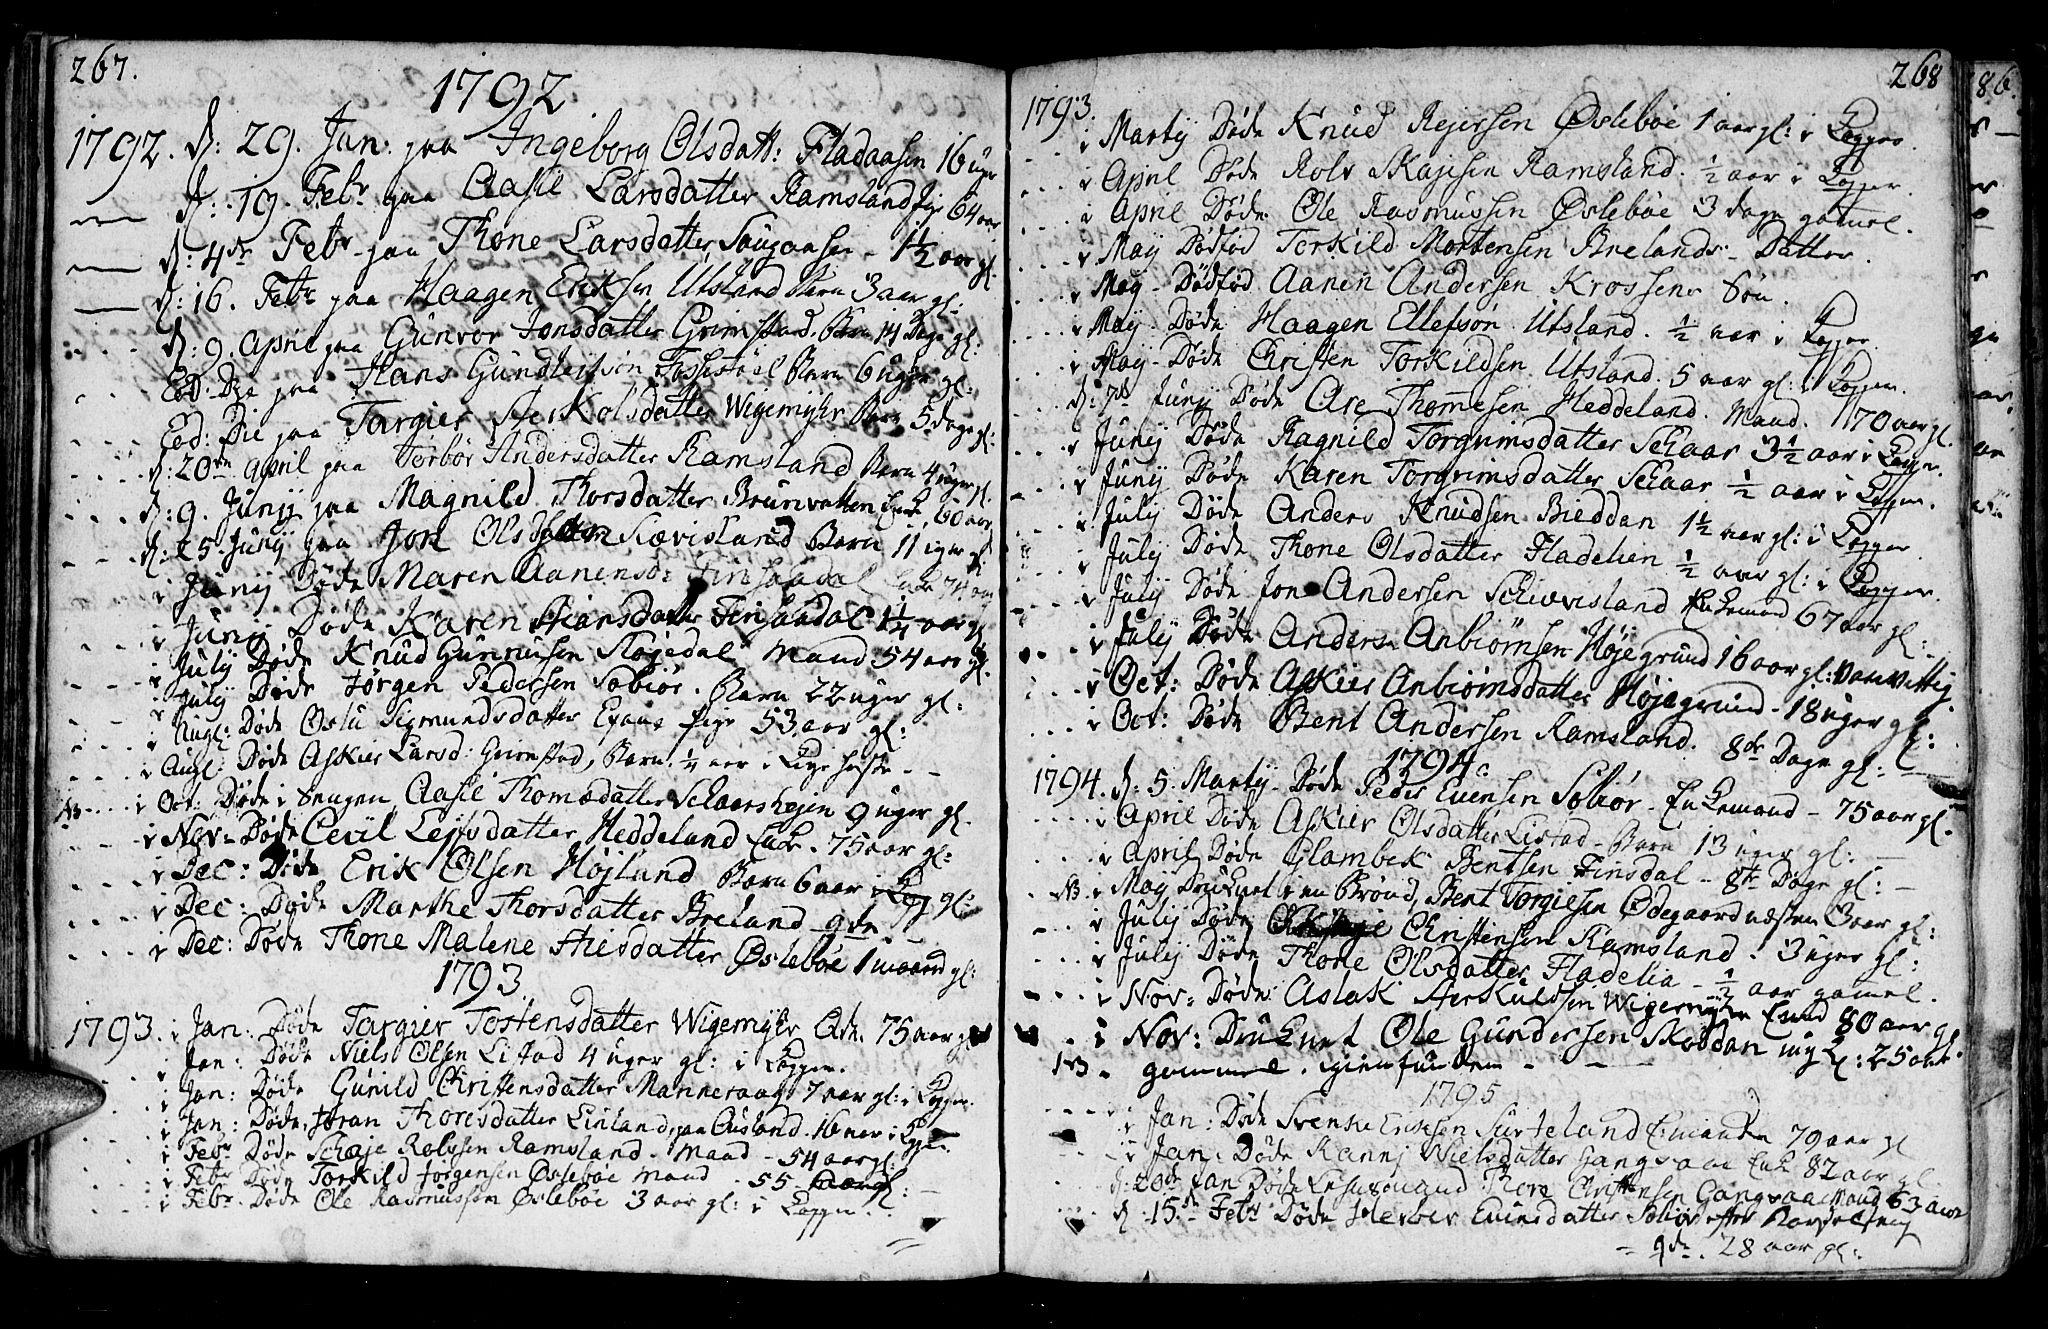 SAK, Holum sokneprestkontor, F/Fa/Fac/L0001: Ministerialbok nr. A 1, 1773-1820, s. 267-268